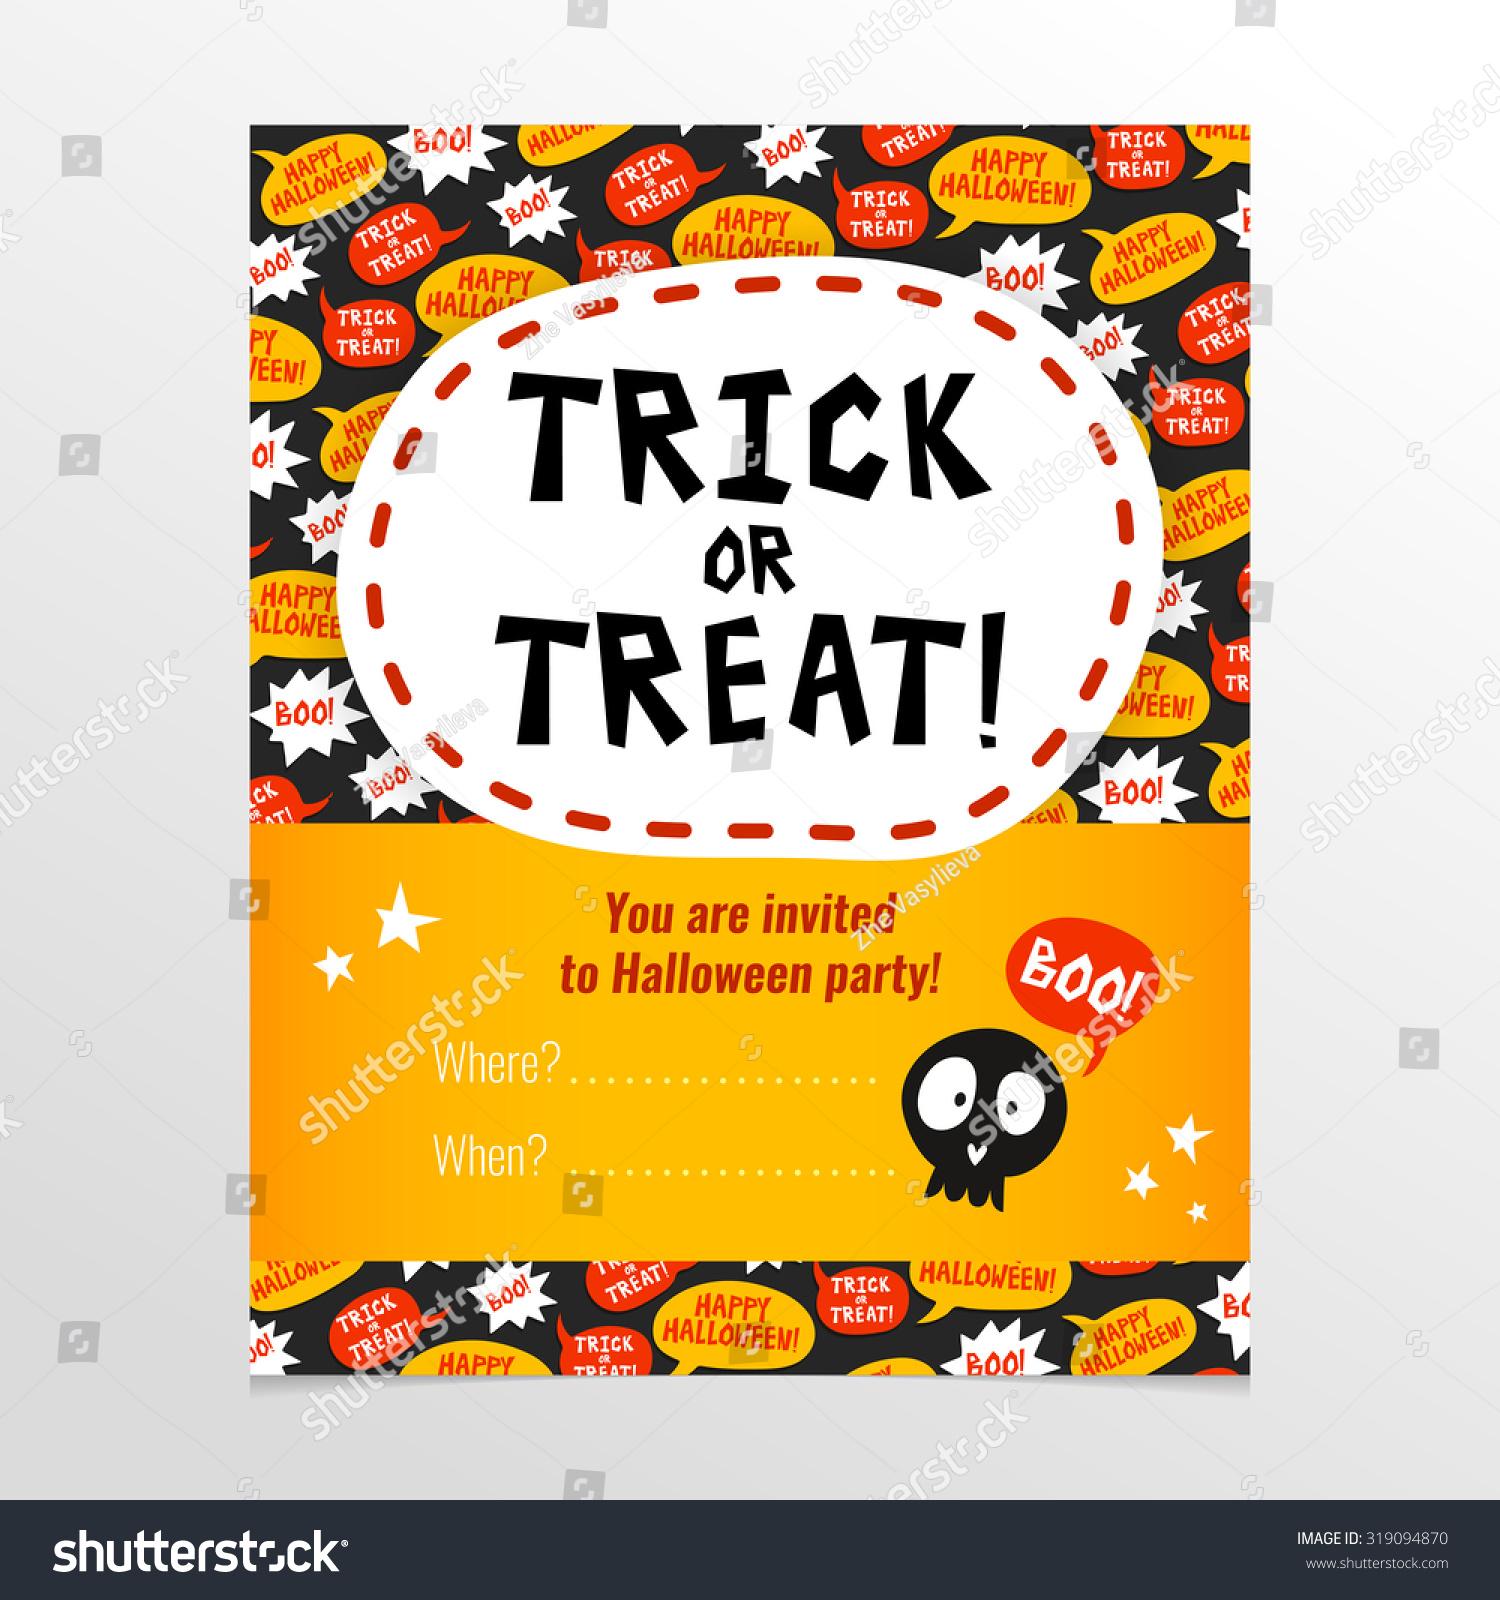 Funny Bright Vector Halloween Party Invitation Stock Vector ...